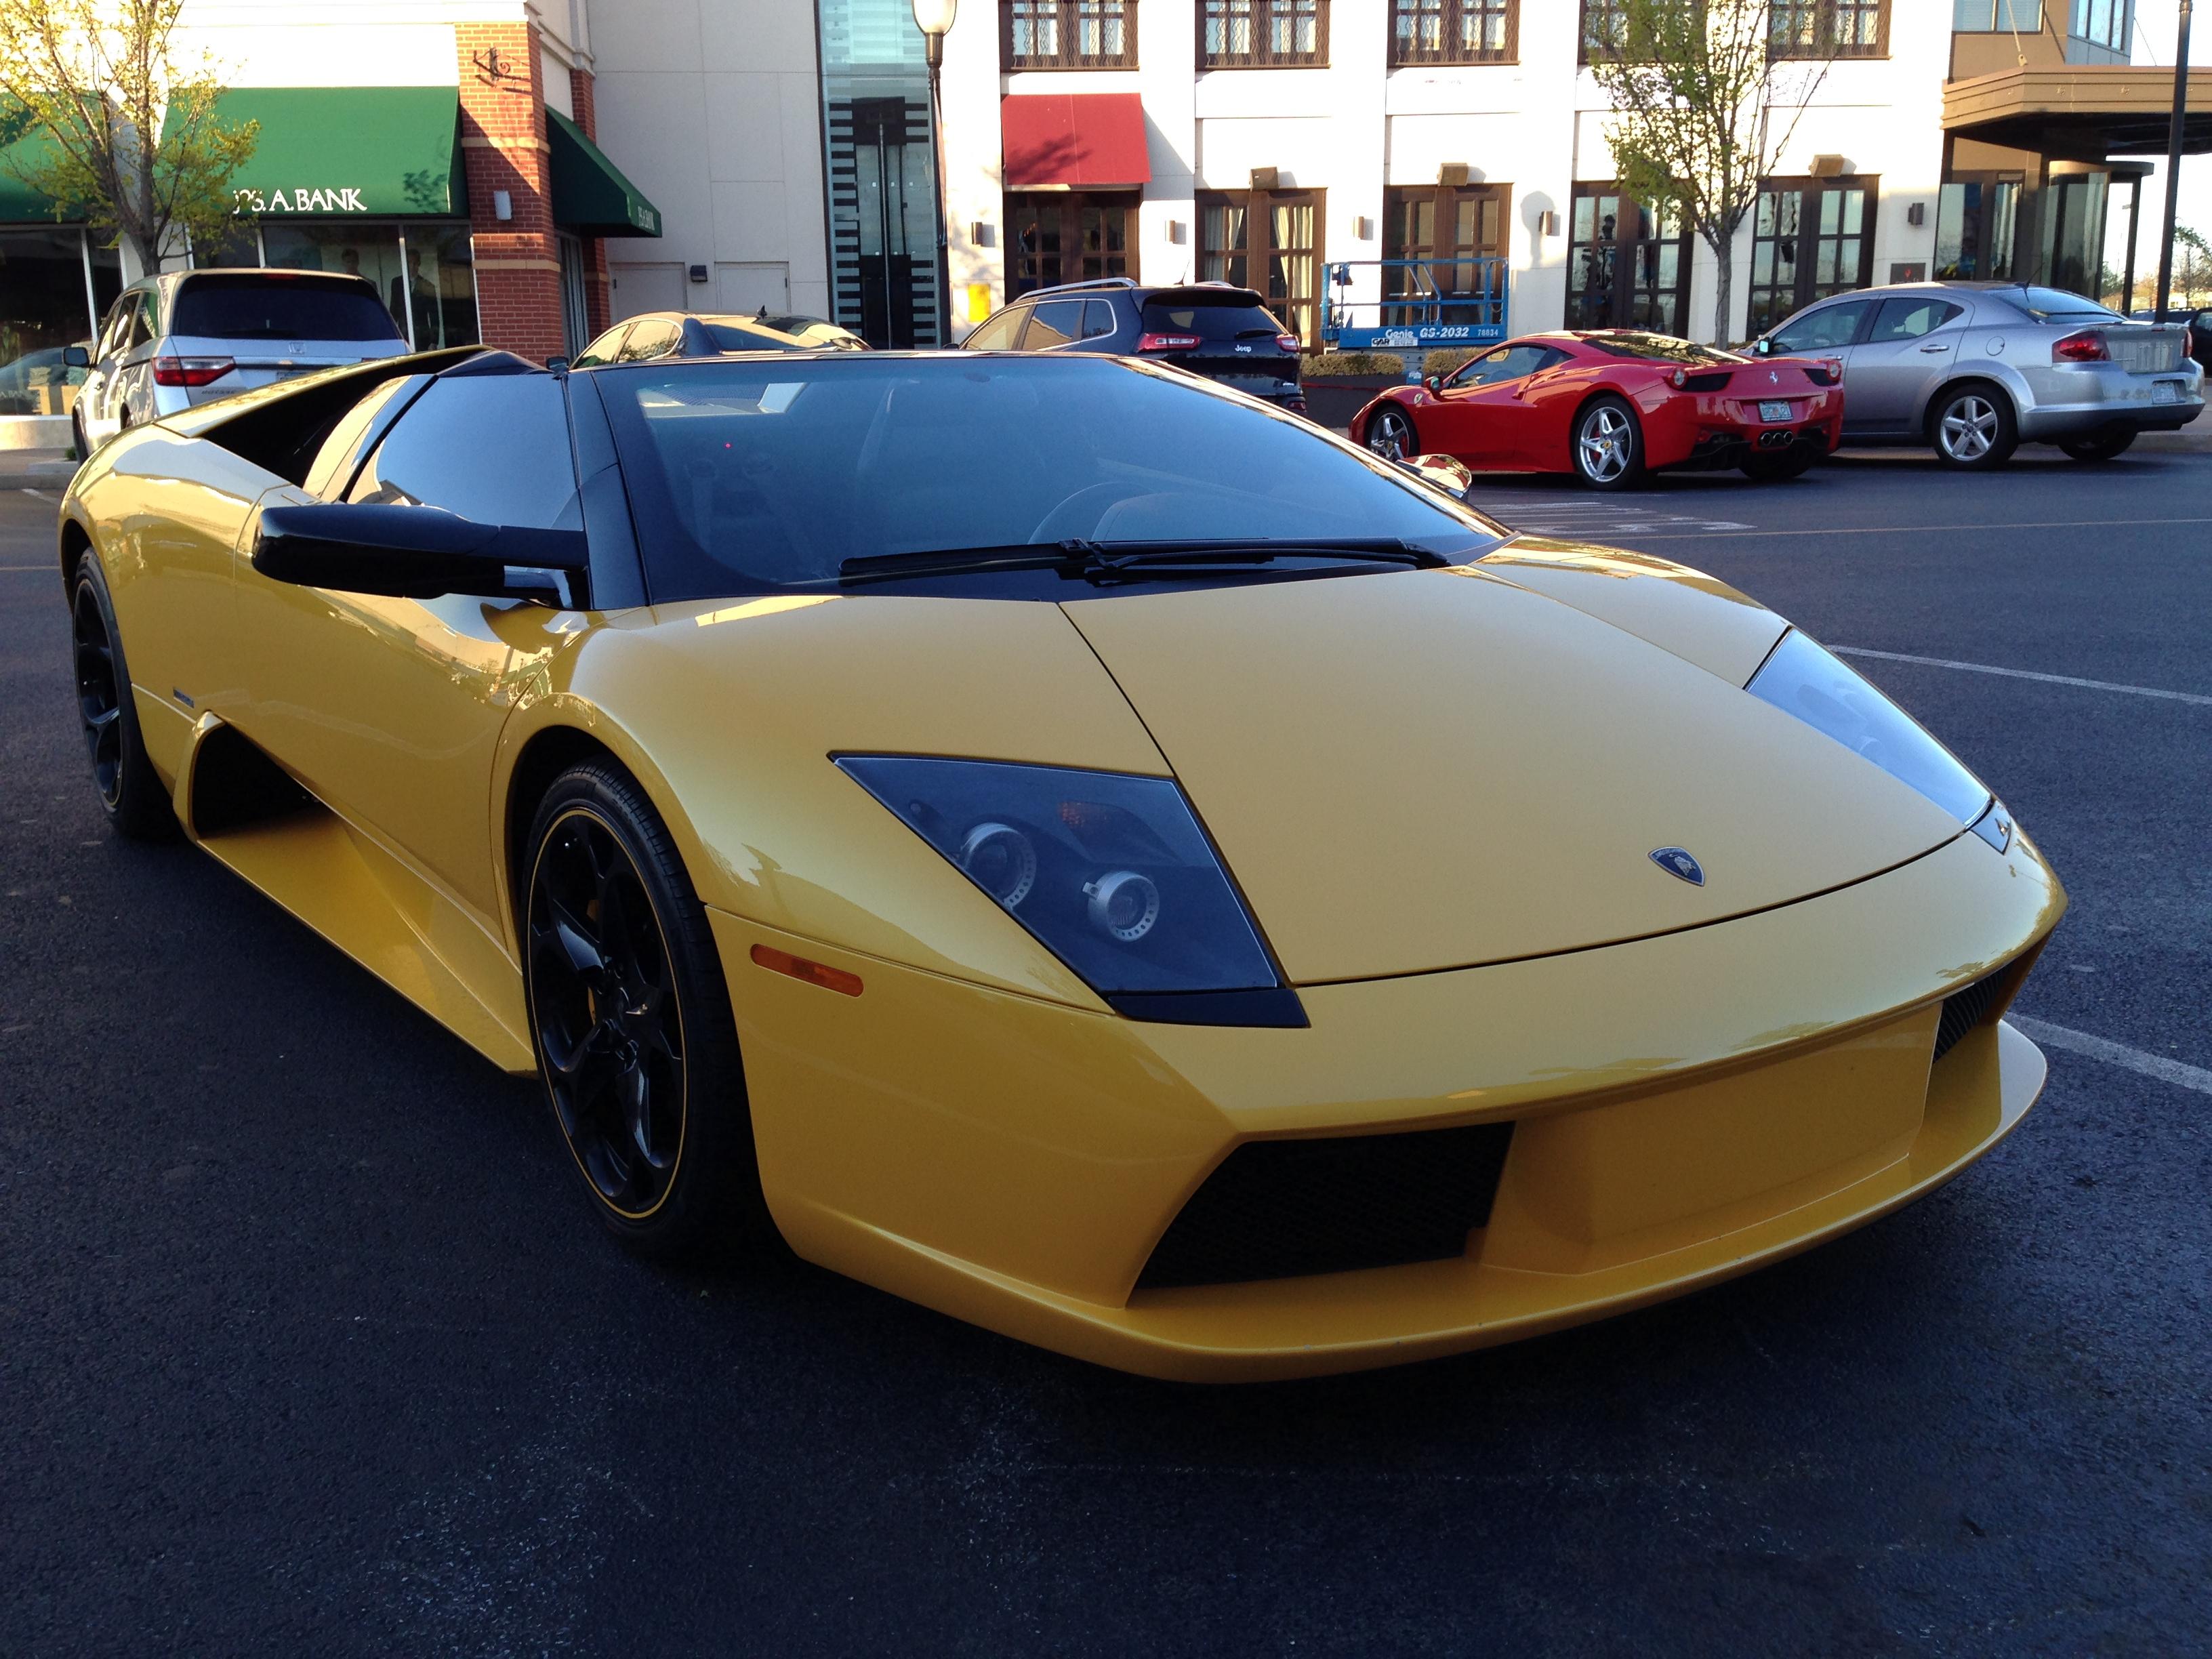 File Lamborghini Murcielago Lp640 4 13922769119 Jpg Wikimedia